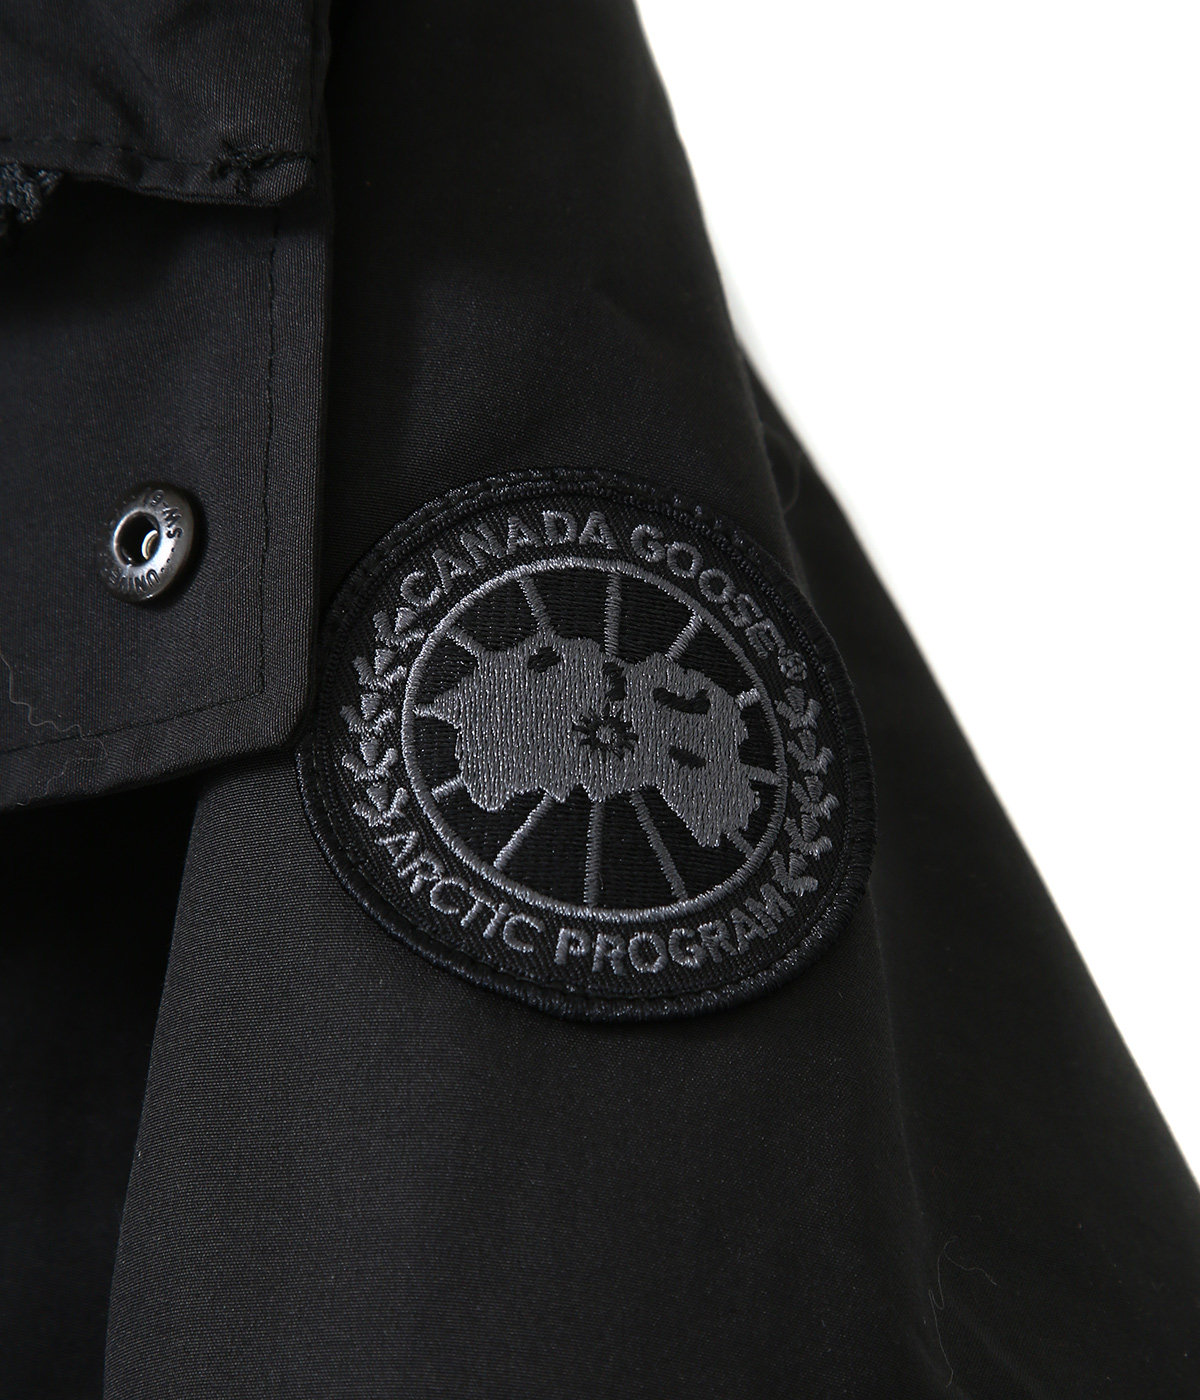 SHERRIDON PARKA FF BLACK LABEL (シェリドン パーカー ブラックレーベル)